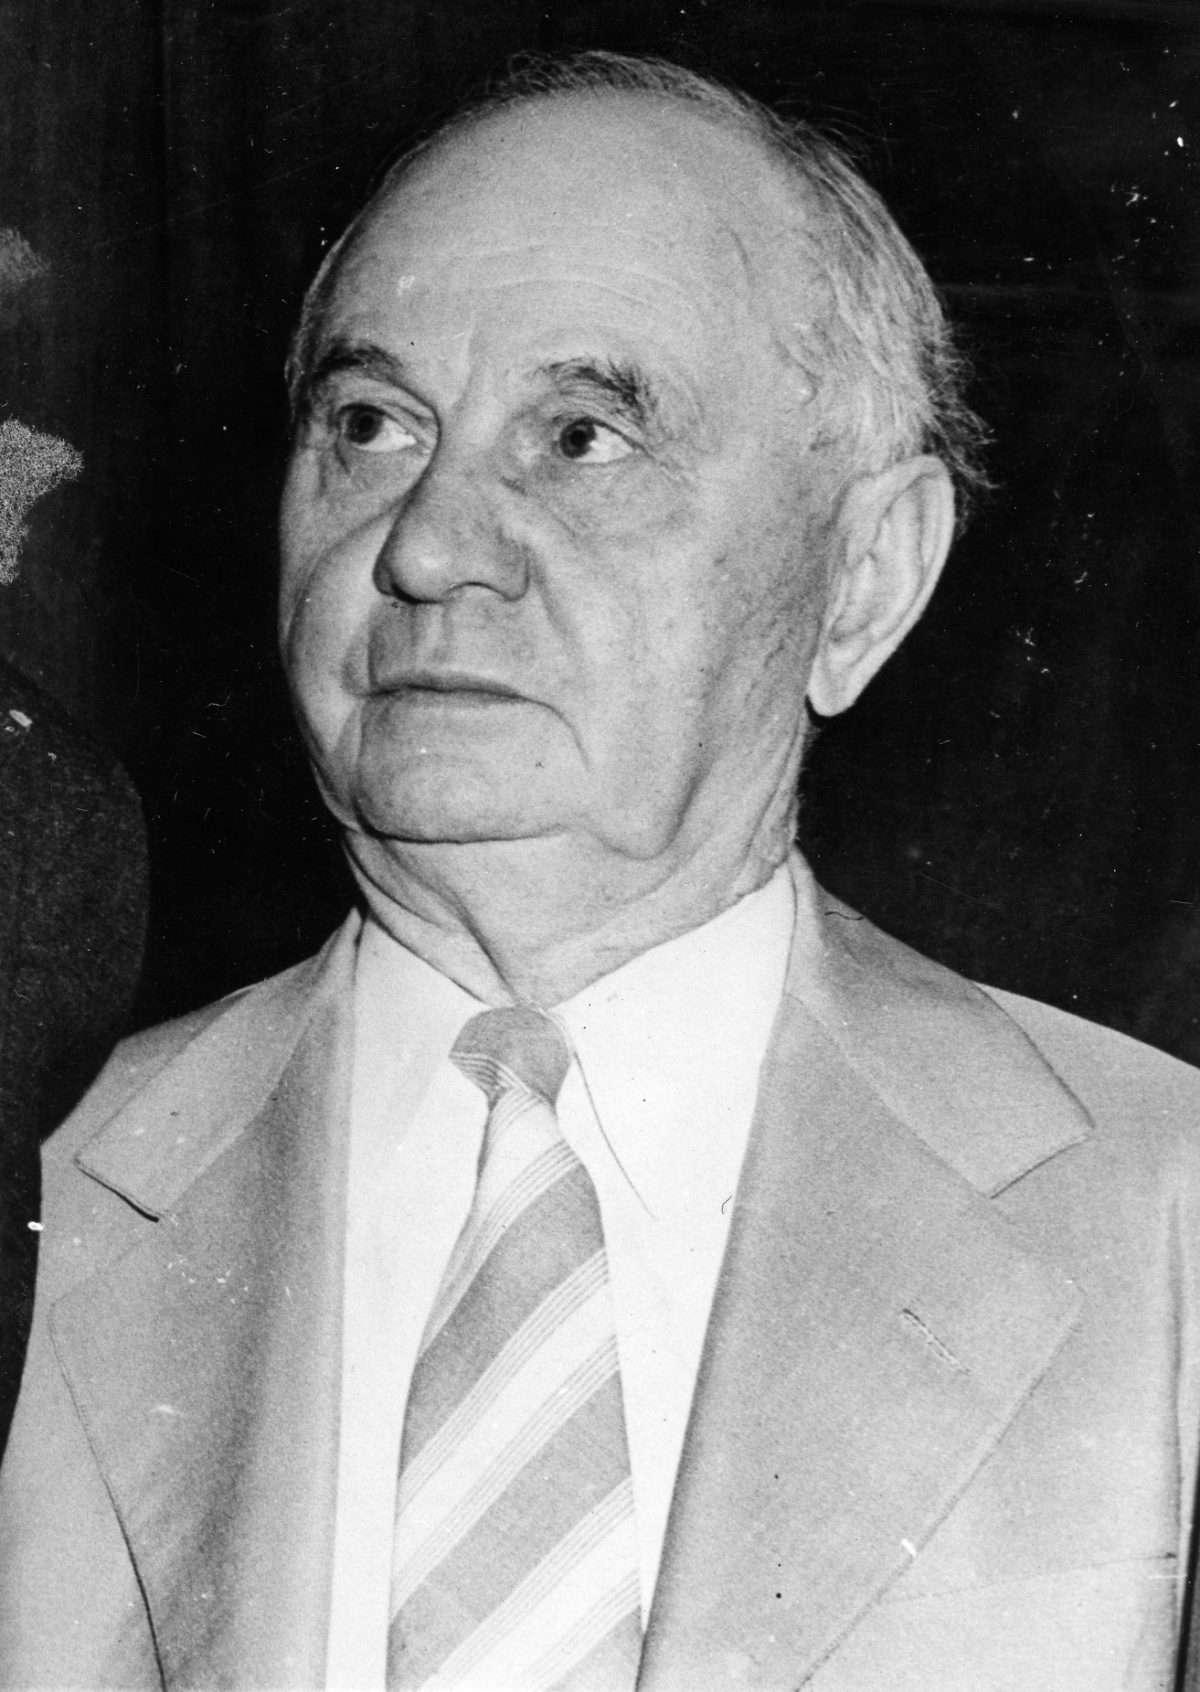 Thomas G. Burch